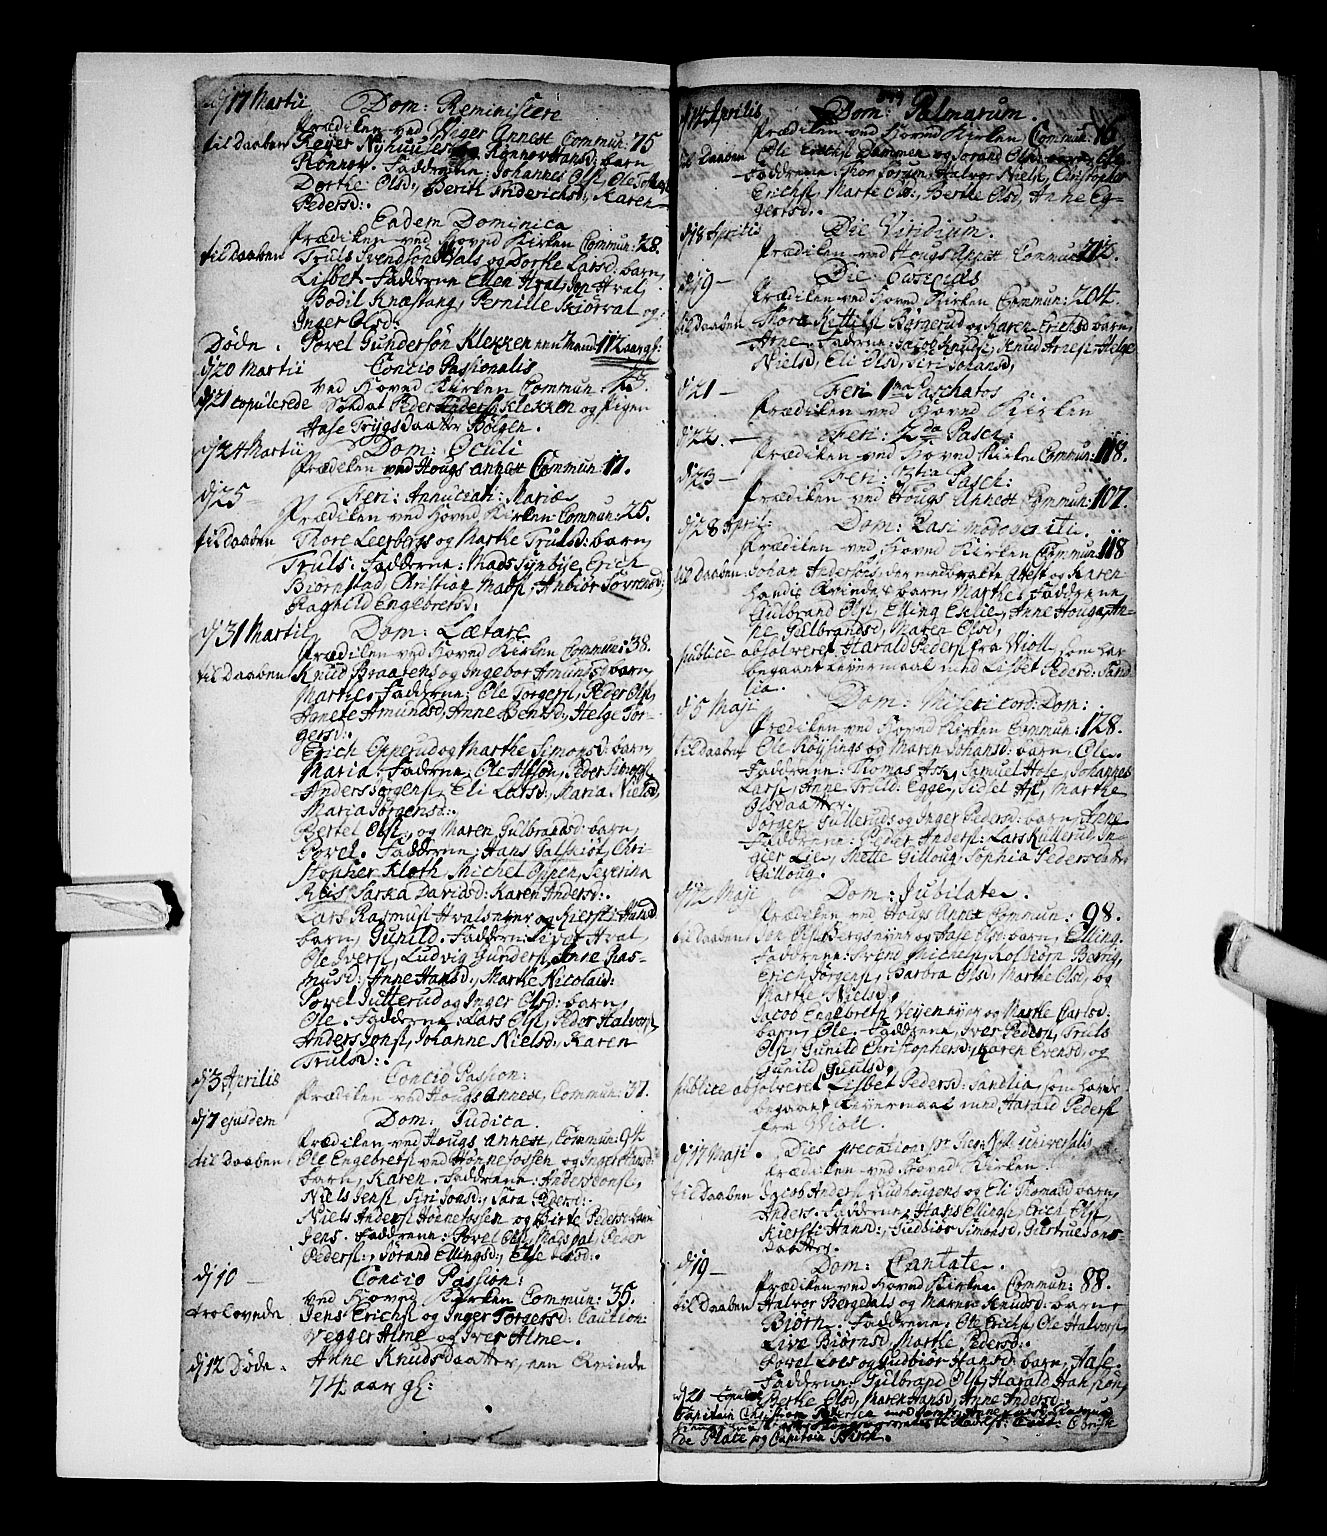 SAKO, Norderhov kirkebøker, F/Fa/L0002b: Ministerialbok nr. 2B, 1726-1739, s. 548-549